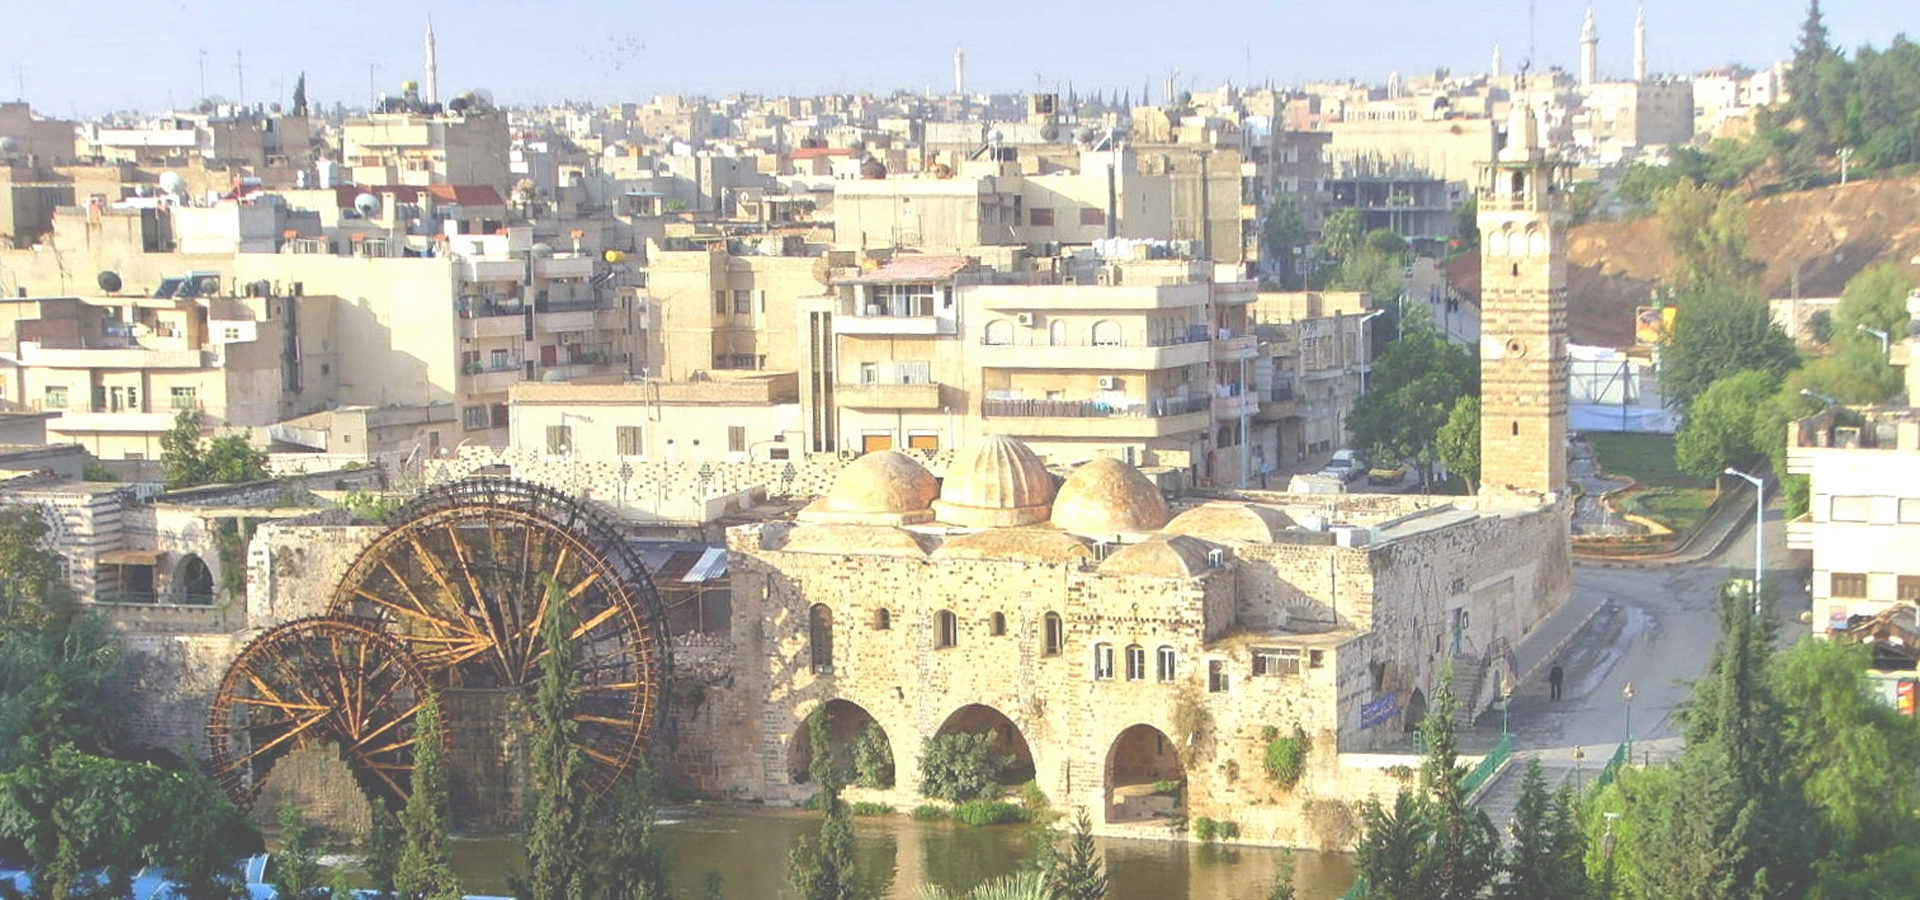 Peer-to-peer advisory in Hama, Syria